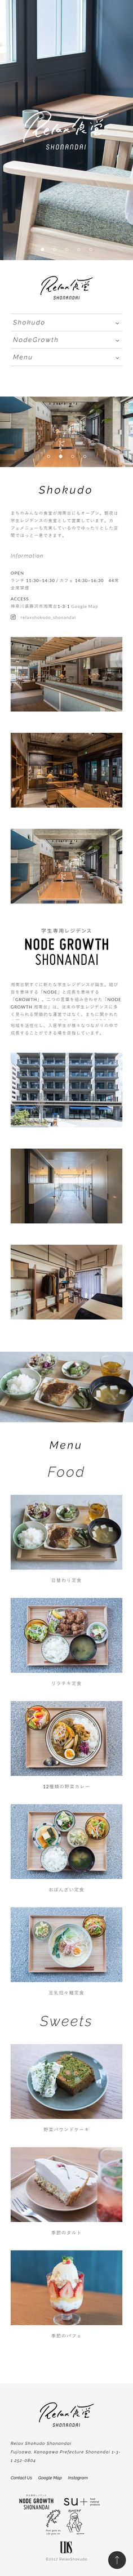 Relax食堂 SHONANDAI | SANKOU! sp ver. | スマホサイト・アプリの参考デザイン集 Mobile Web Design, Japanese Typography, Identity, Restaurants, Inspire, Graphics, Website, Logo, Interior